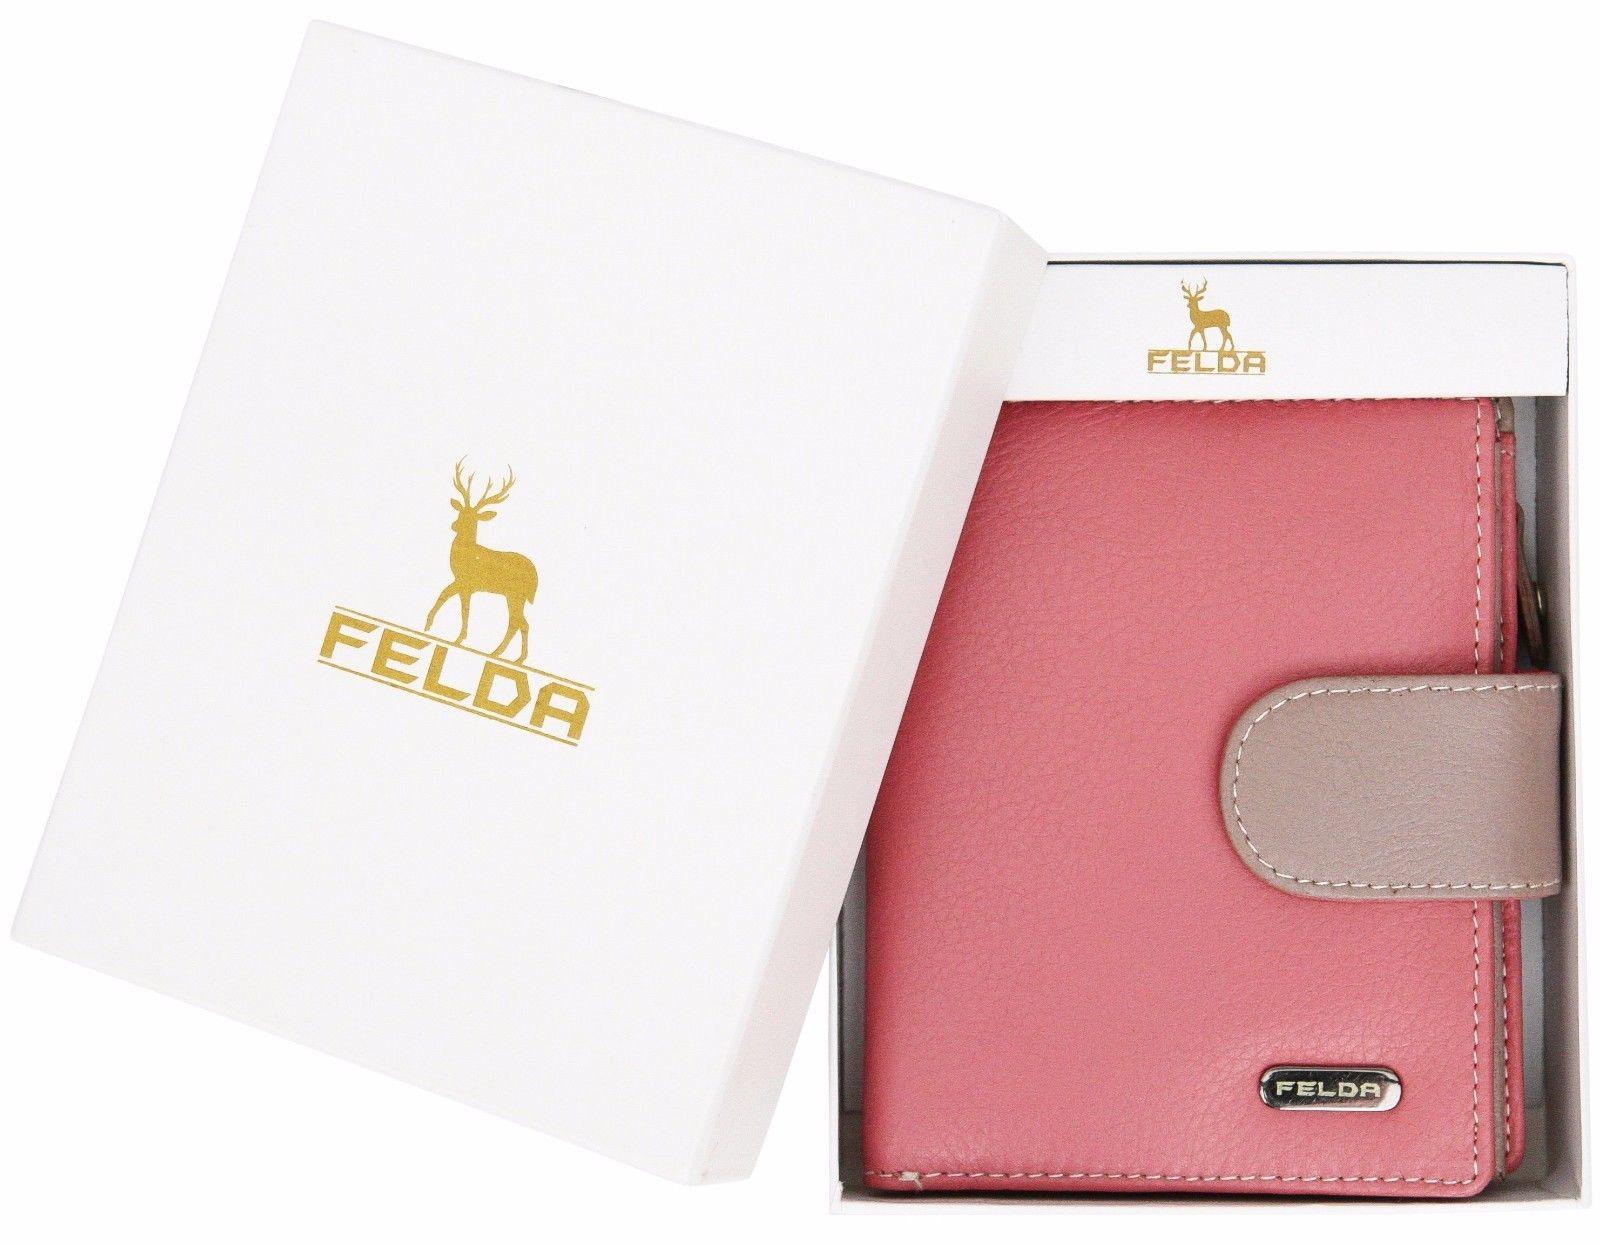 Felda-RFID-onorevoli-MEDAGLIA-amp-Card-Purse-Wallet-Genuine-Leather-Multi-SOFT-BOX-REGALO miniatura 87